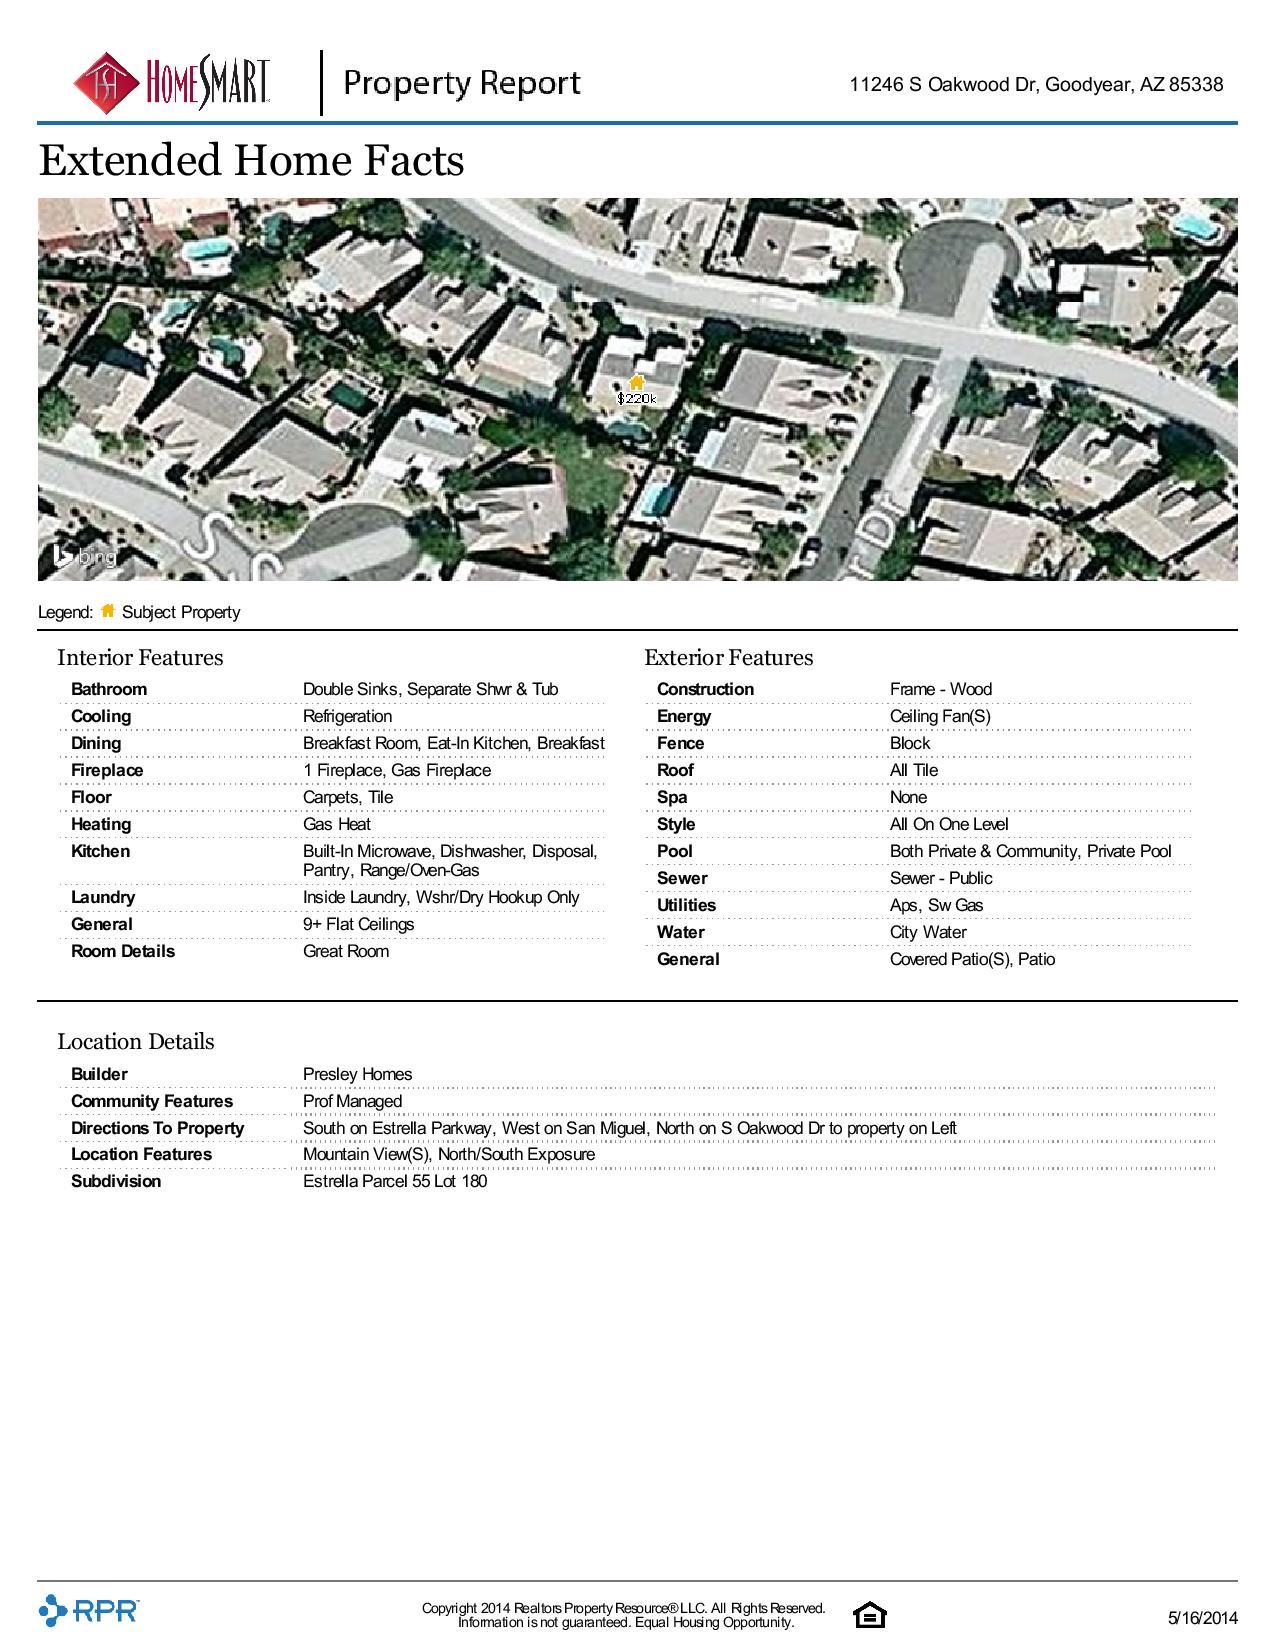 11246-S-Oakwood-Dr-Goodyear-AZ-85338-page-004